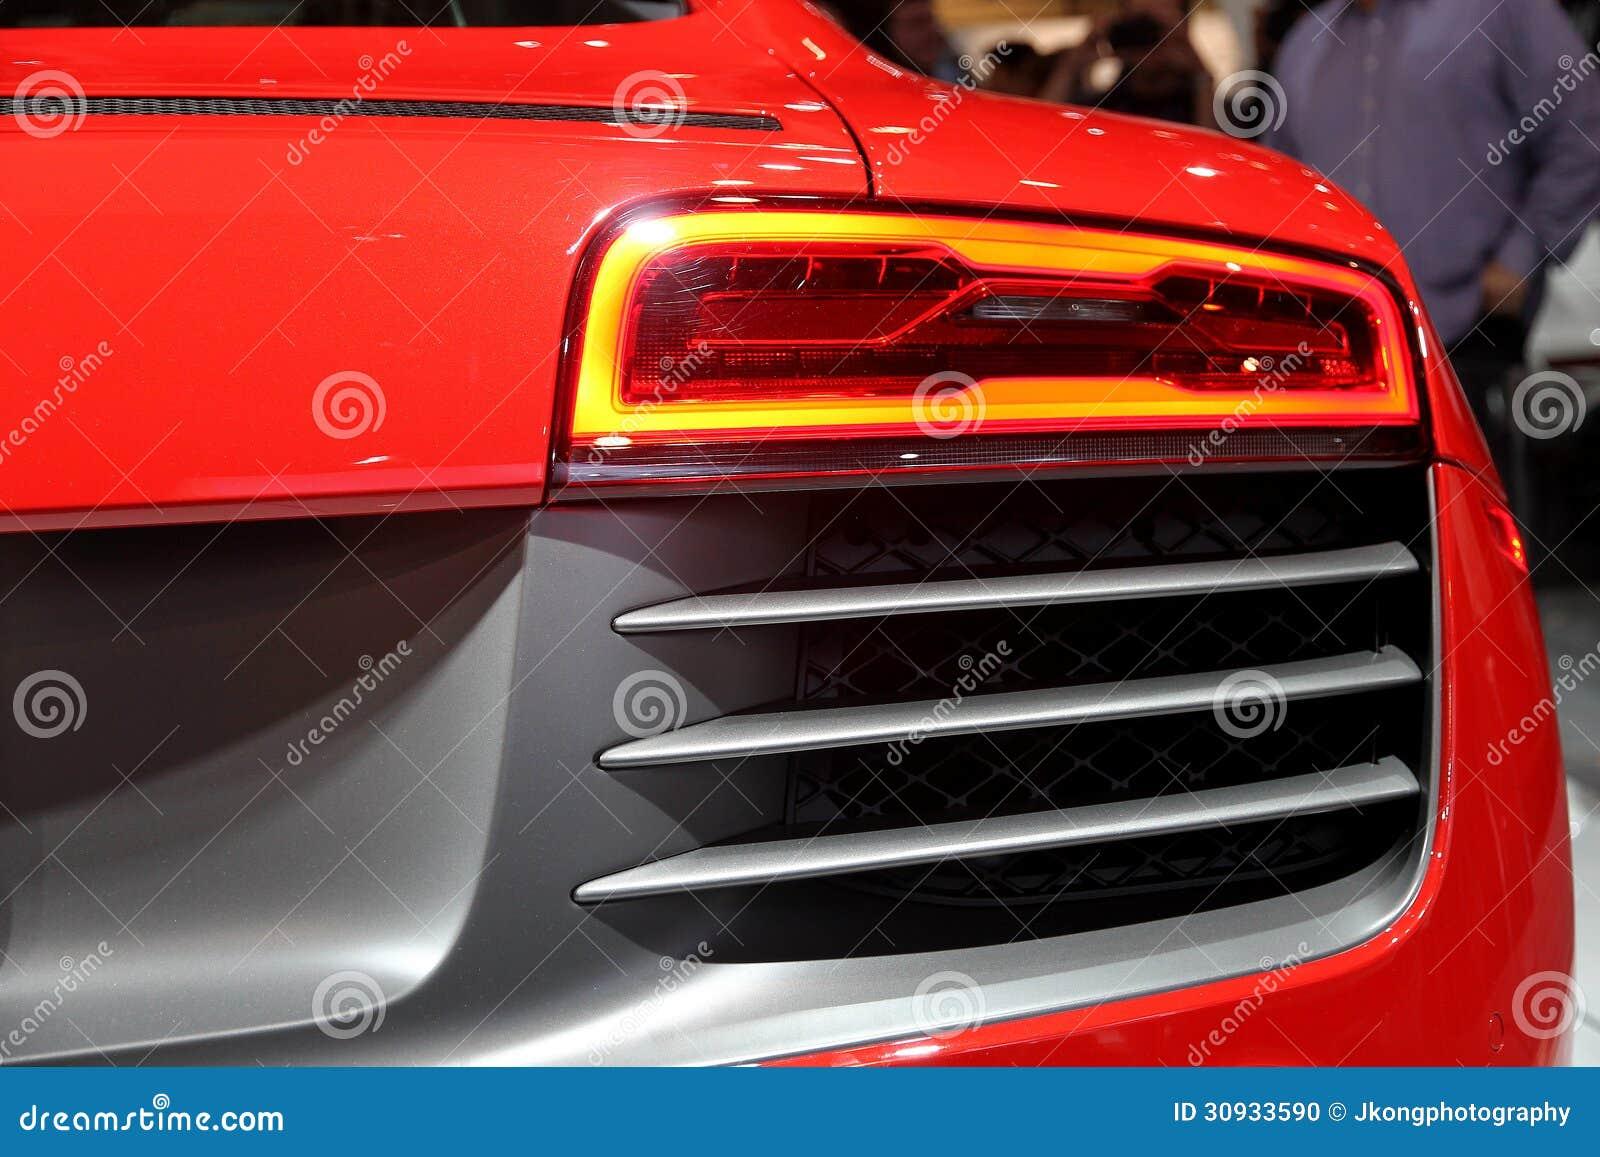 Audi r8 v10 060 time 13